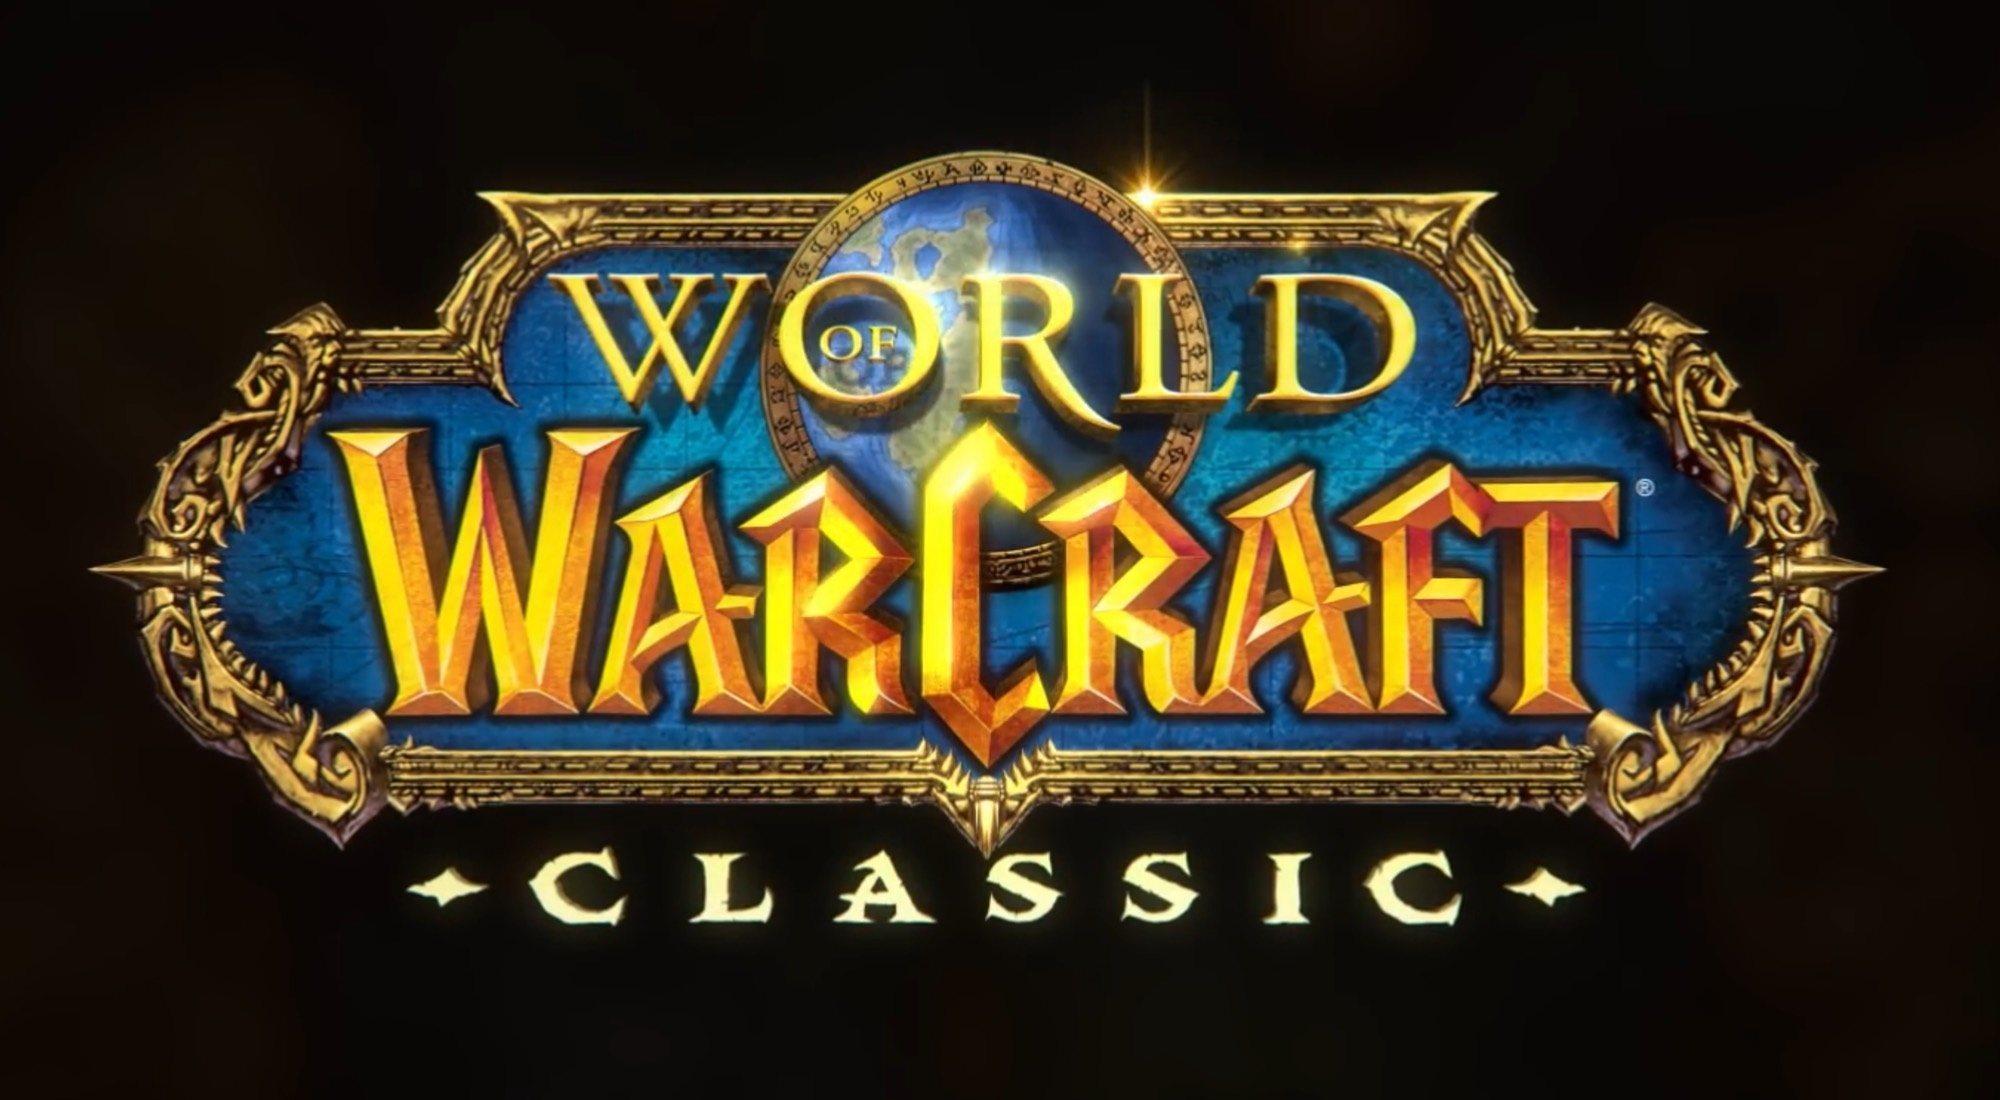 'World of Warcraft Classic' arrasa en Twitch y colapsa la red